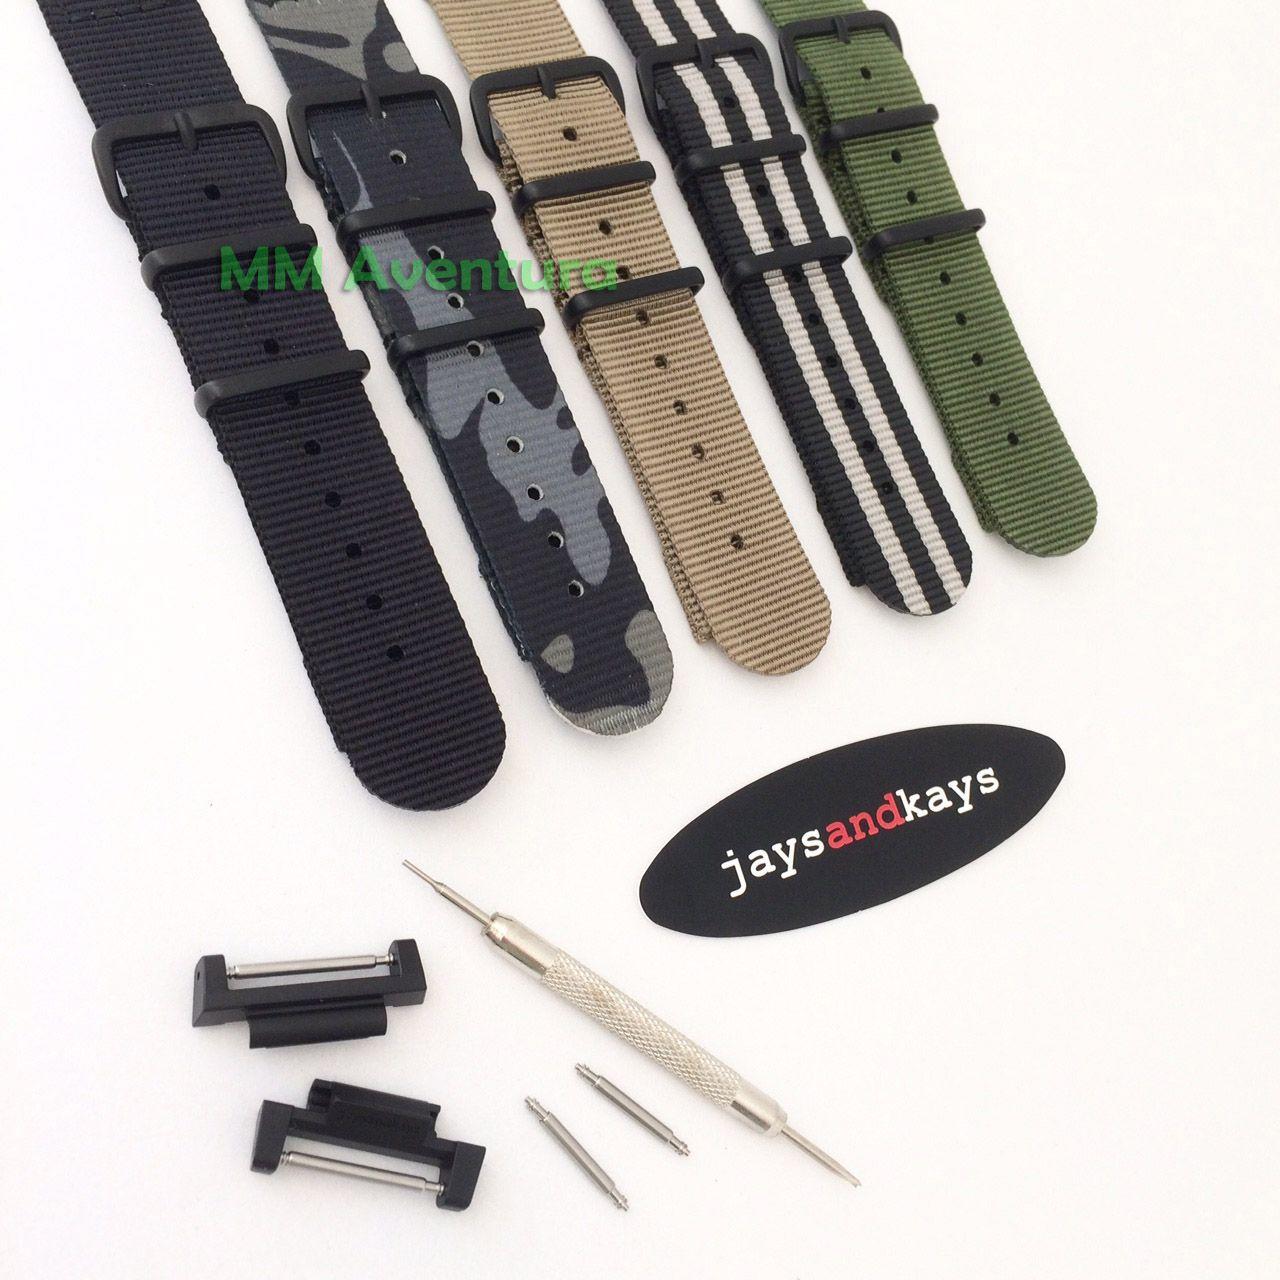 Pulseira Nylon 2 pç Nato Zulu JaysAndKays p/ G-Shock 20mm p/ DW5600 e outros